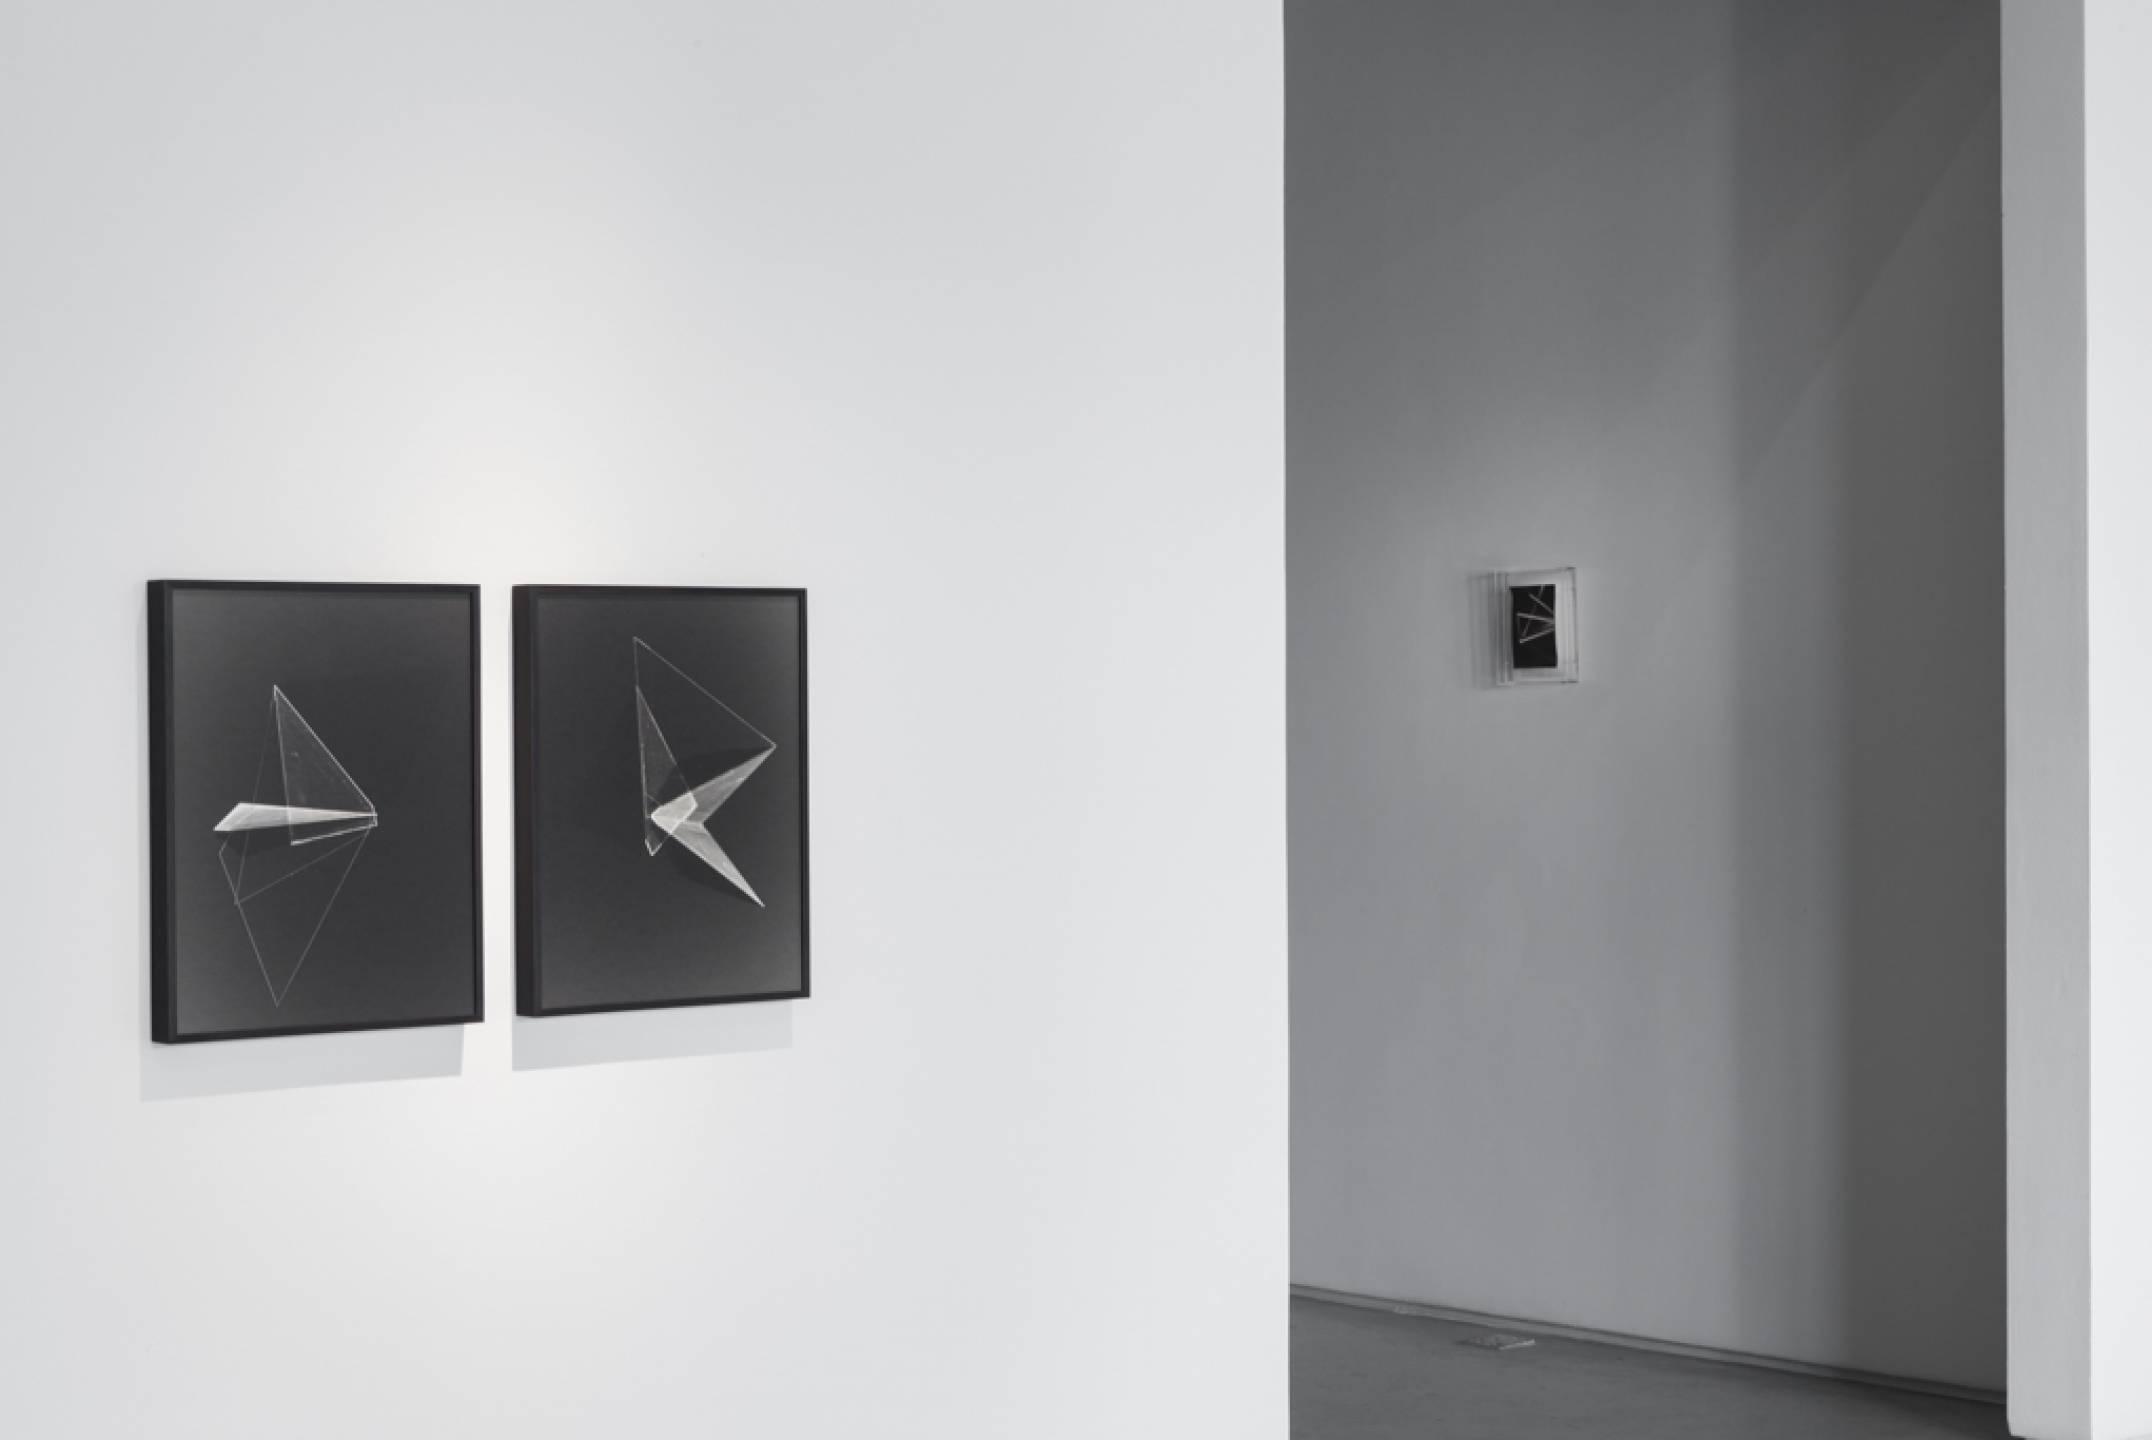 Letícia Ramos,<em>Planisphere</em>, Mendes Wood DM, São Paulo, 2017 - Mendes Wood DM